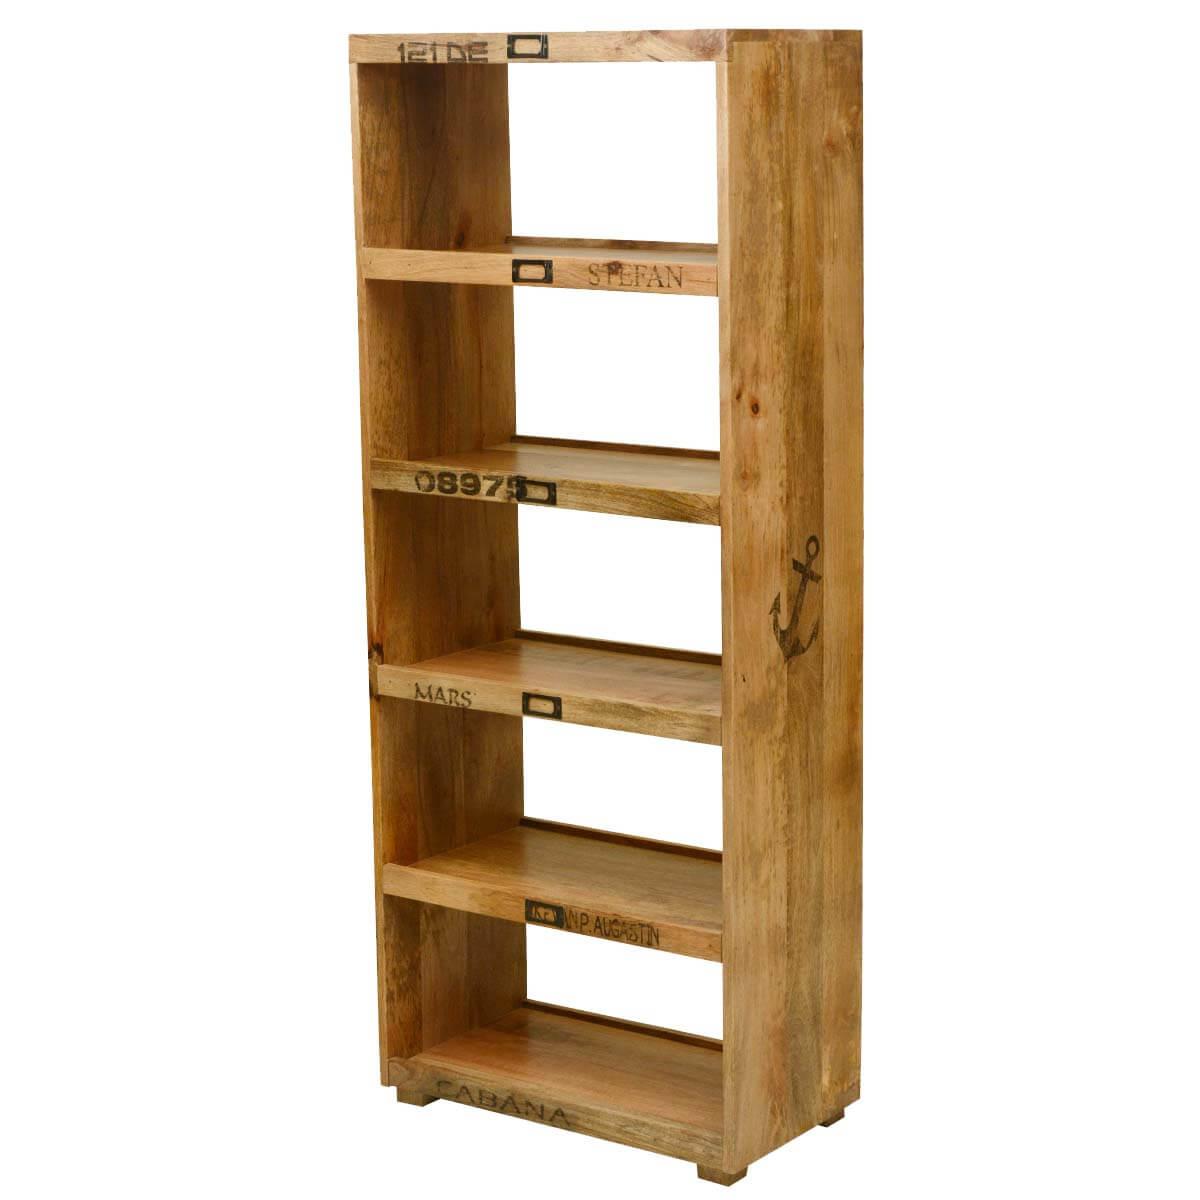 Morelia 5 Open Shelf Rustic Solid Wood Tall Narrow Bookcase